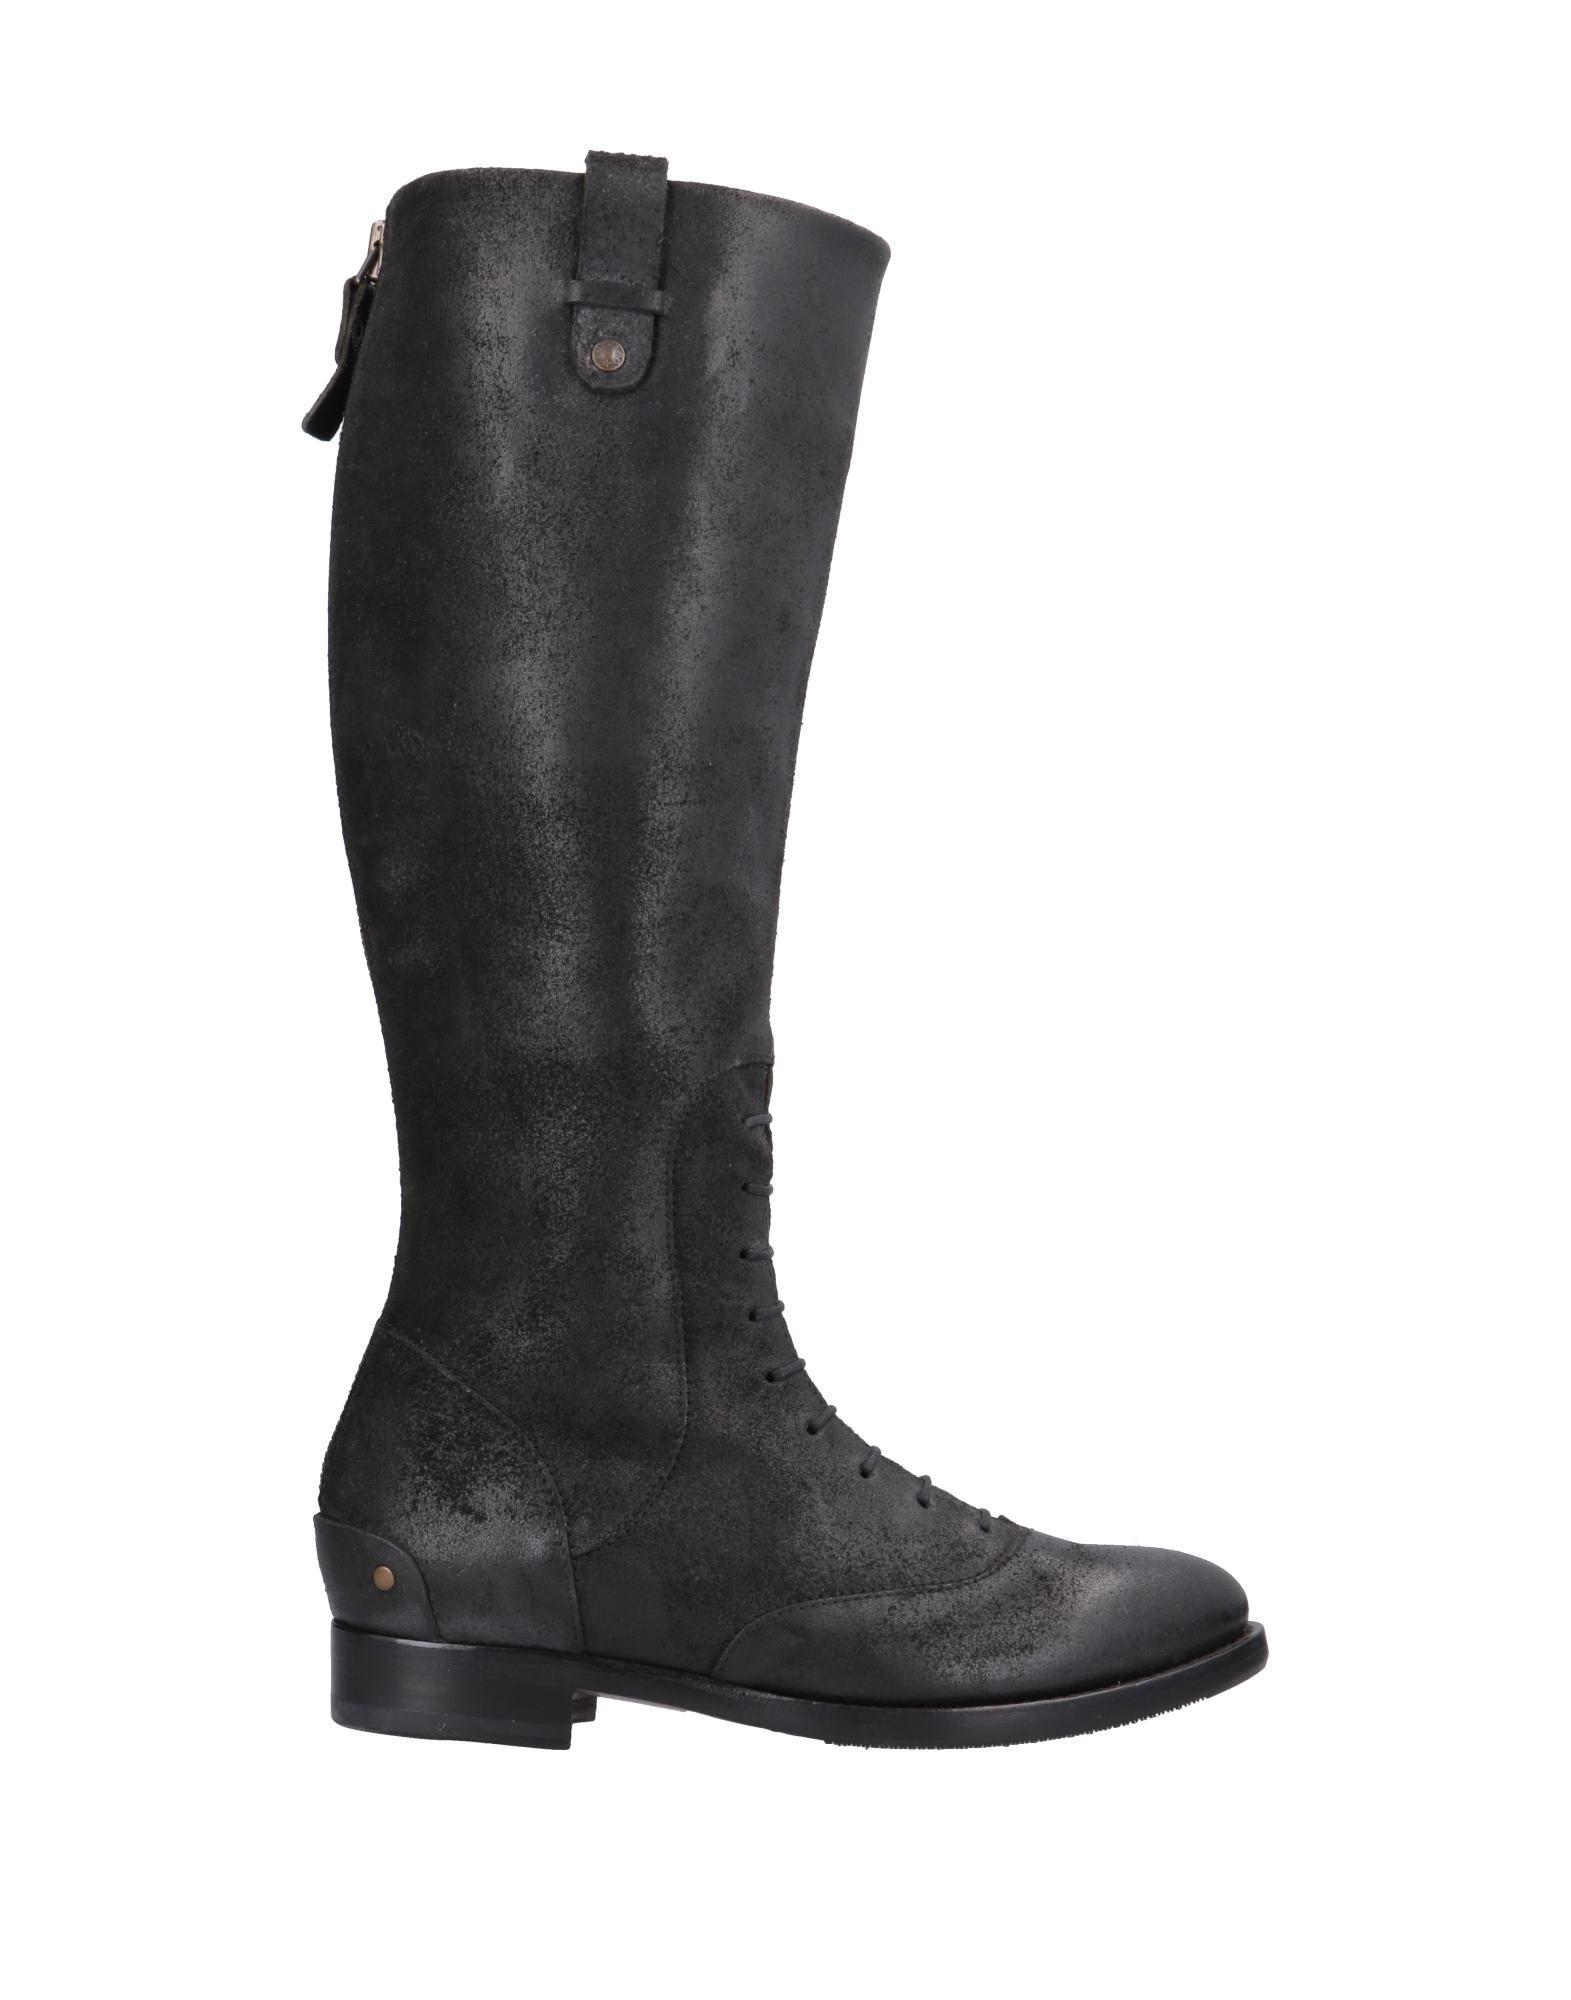 Buttero® Stiefel strapazierfähige Damen  11544439ORGut aussehende strapazierfähige Stiefel Schuhe 446233